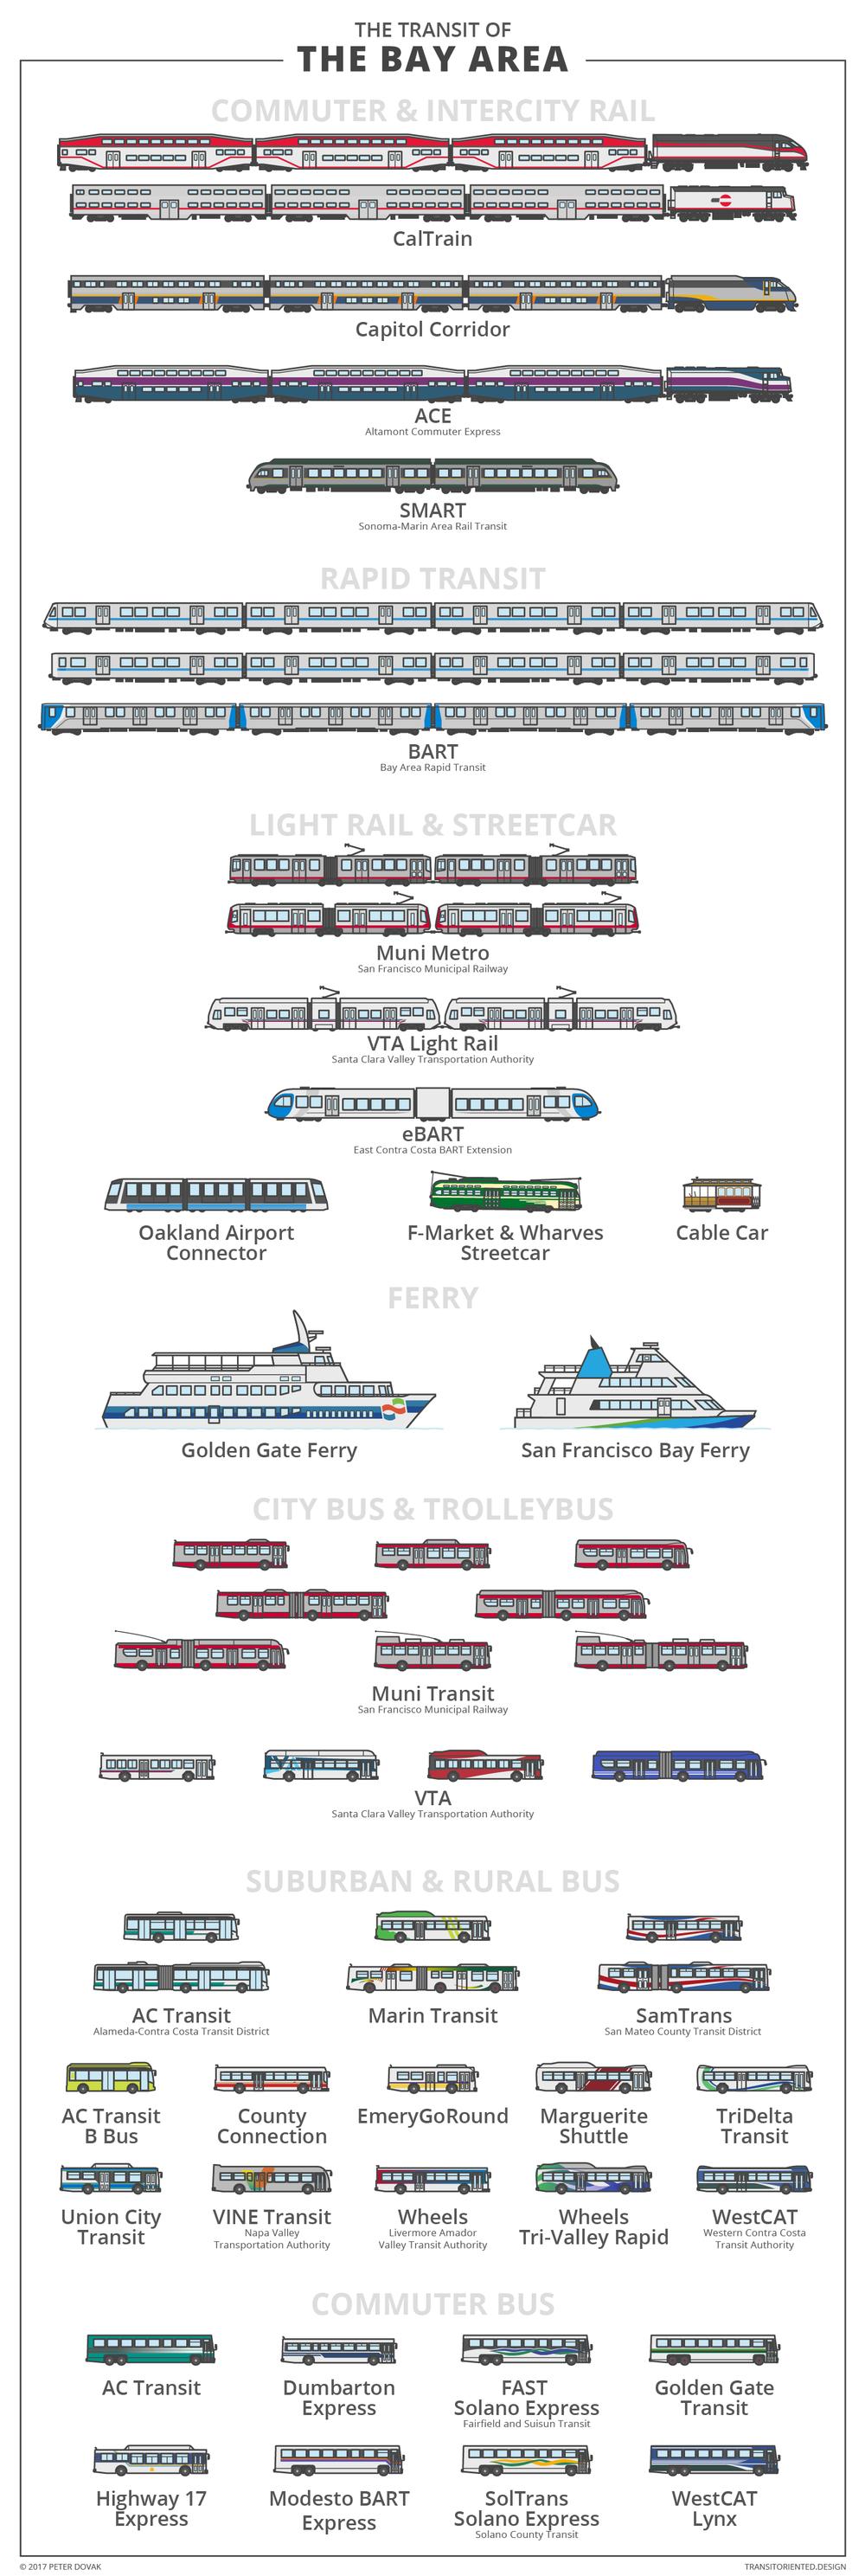 infographic-bayarea.png